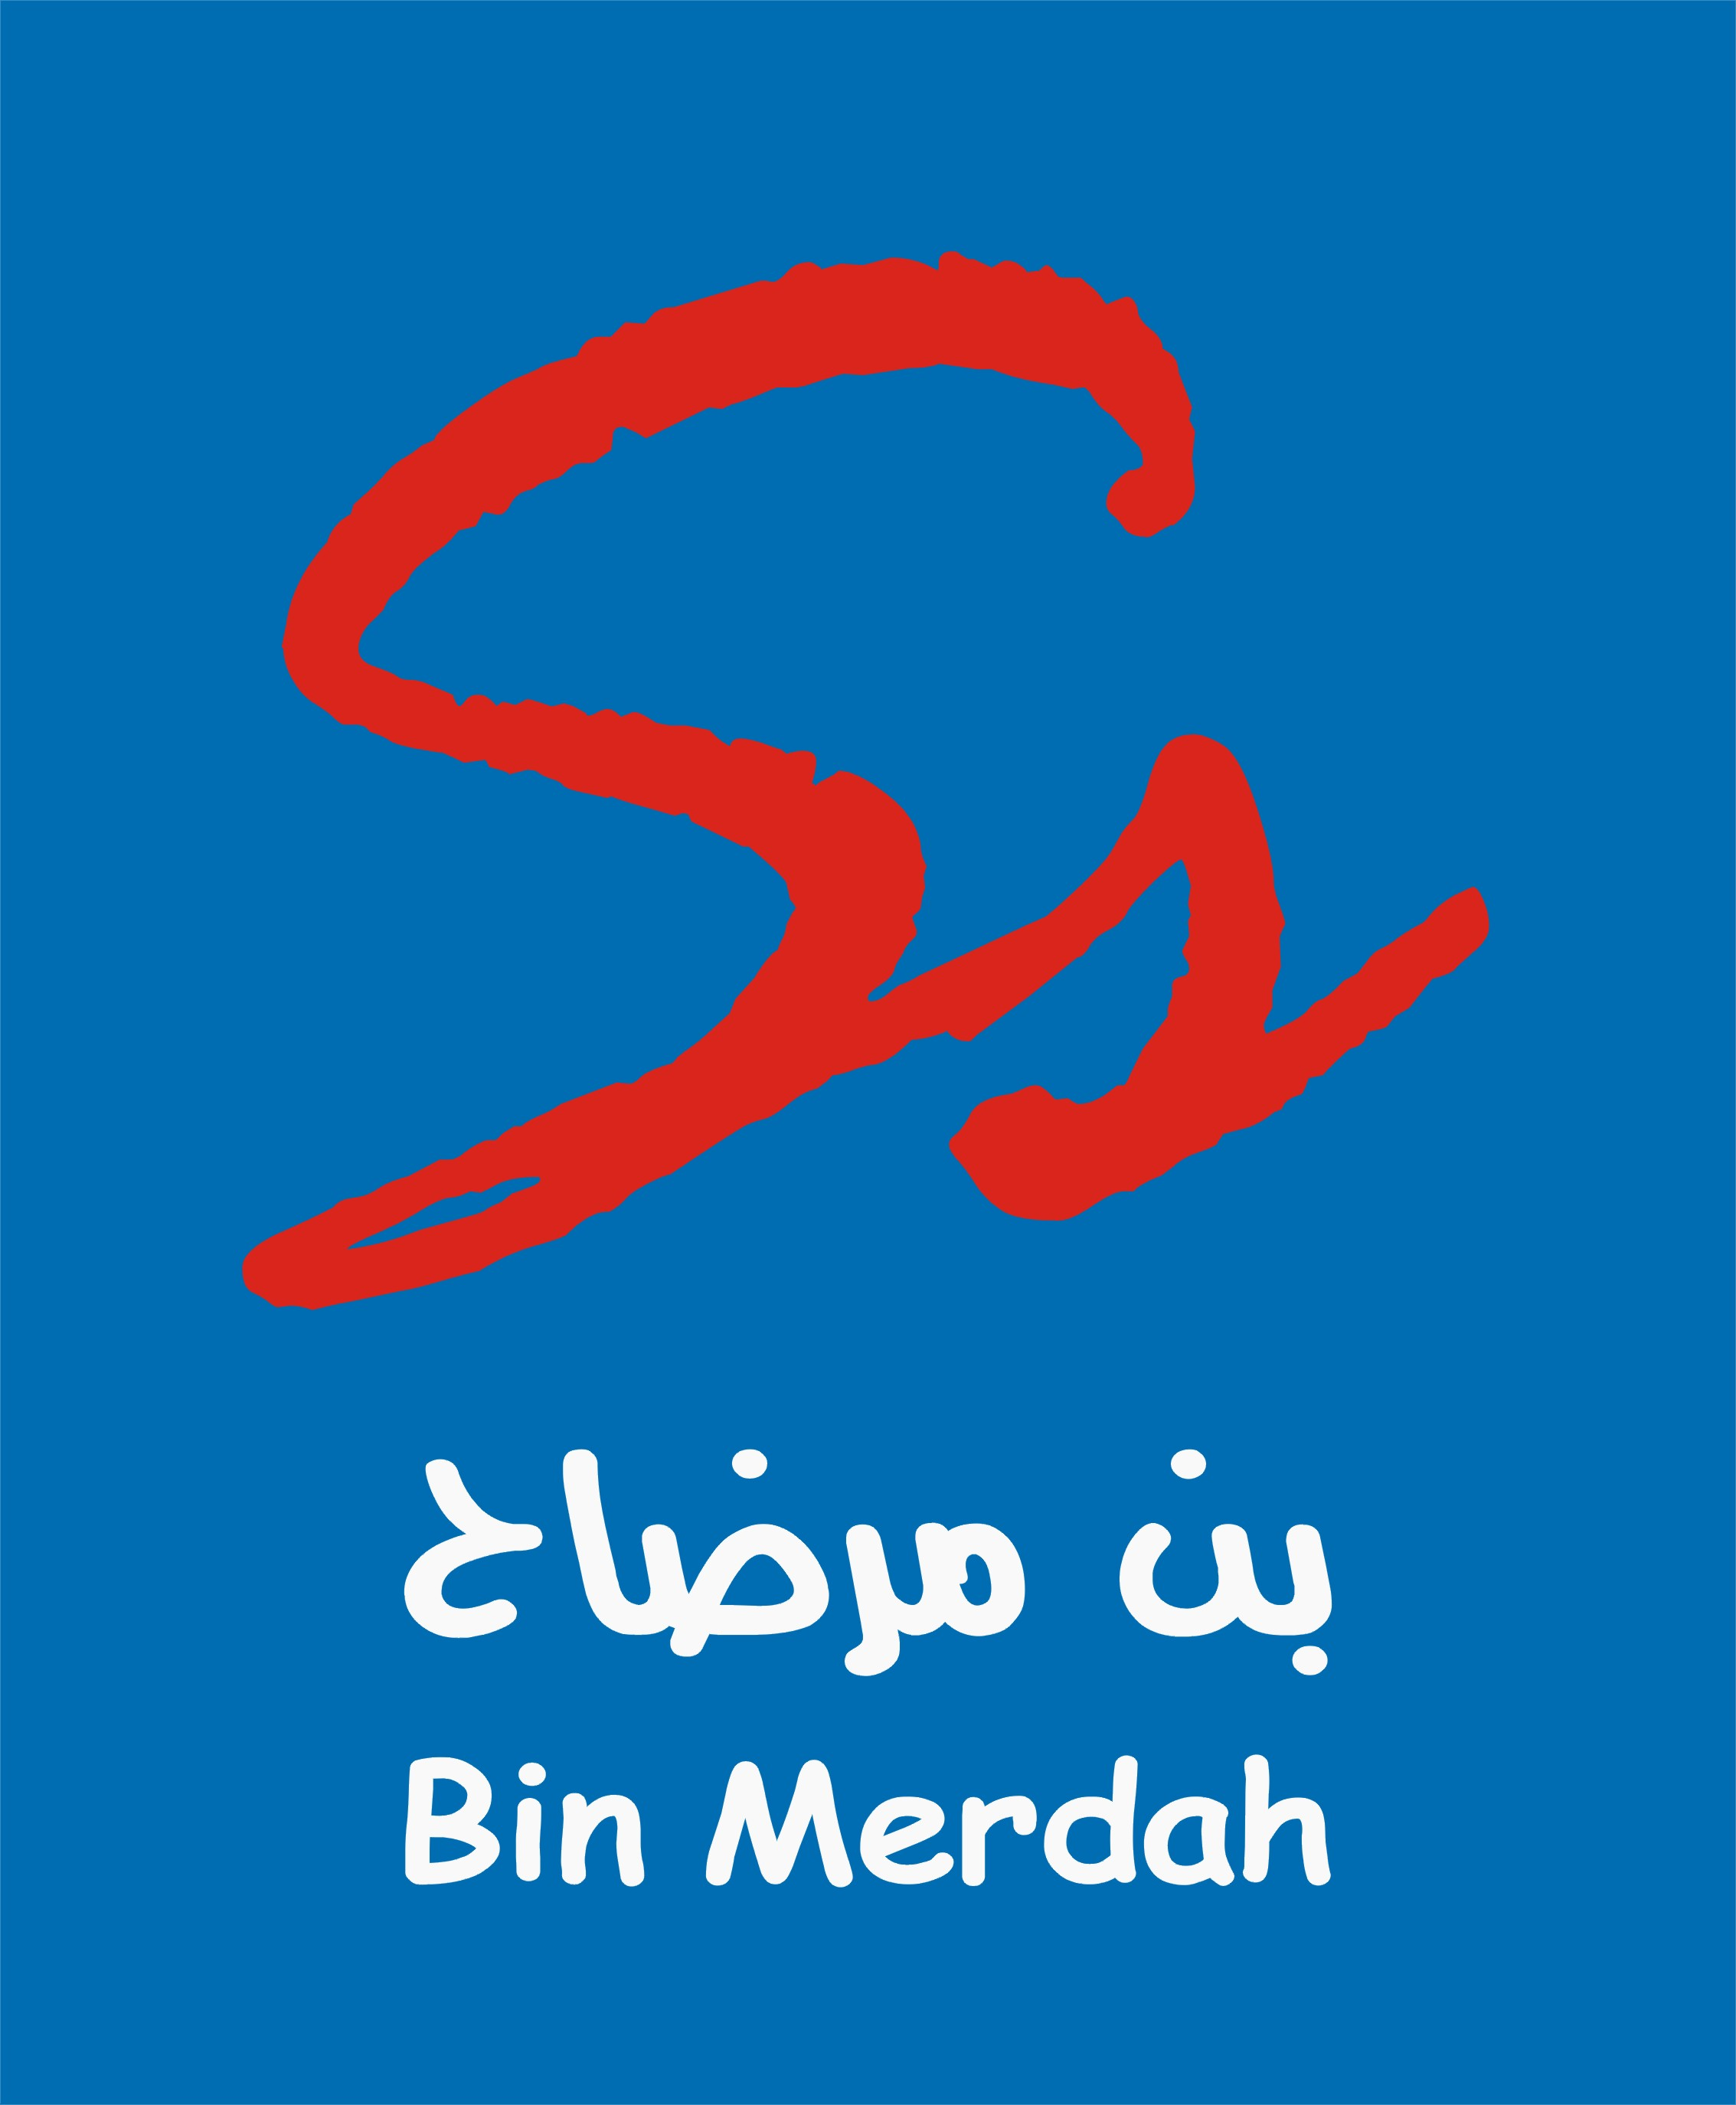 Bin Merdah Gas Station - ALSulaymaniyah